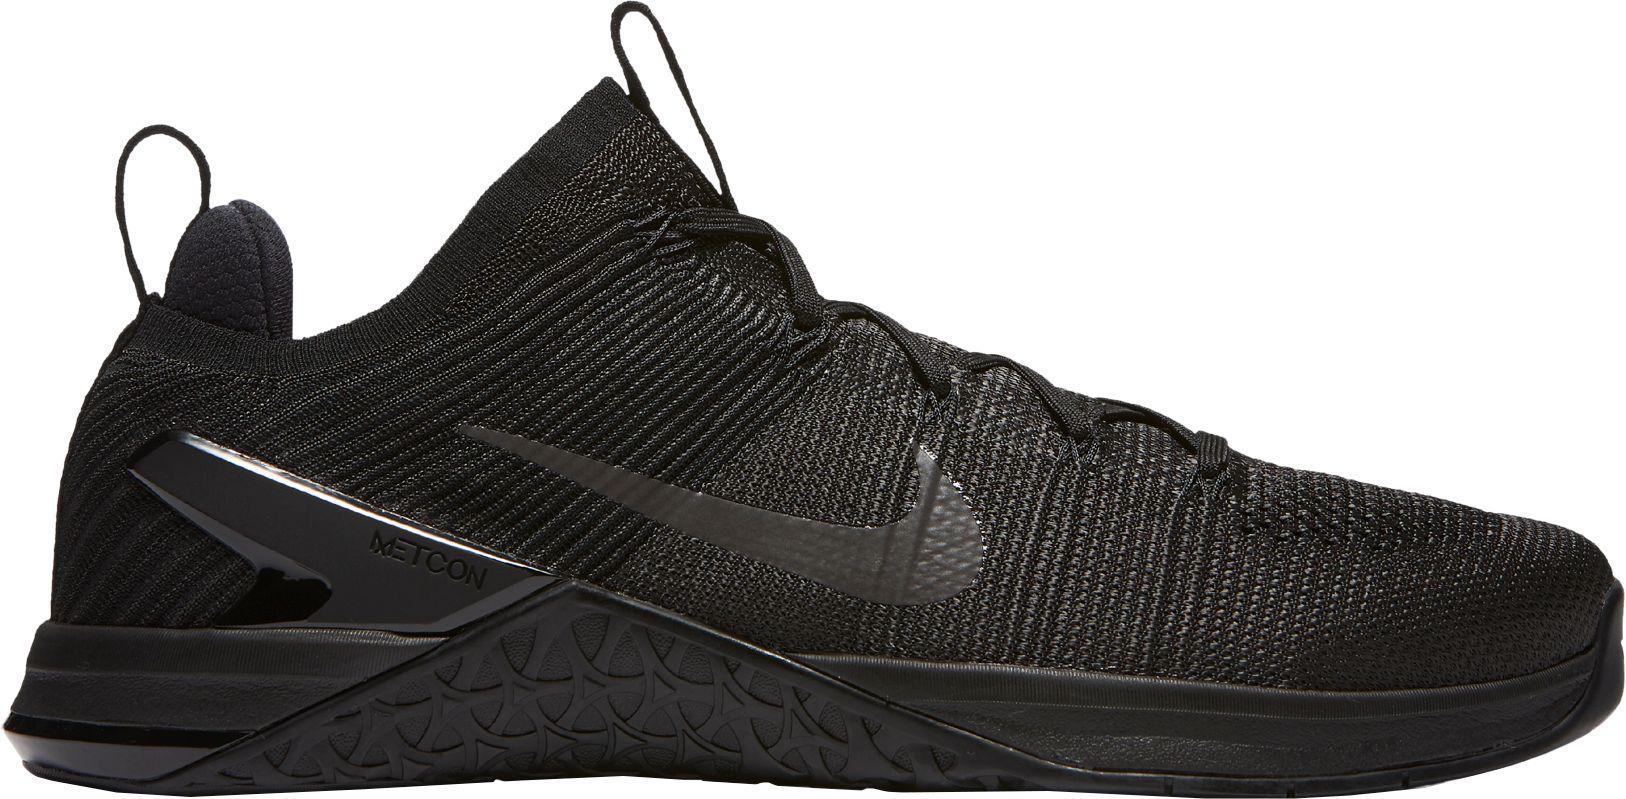 Nike - Black Metcon Dsx Flyknit 2 Training Shoes for Men - Lyst